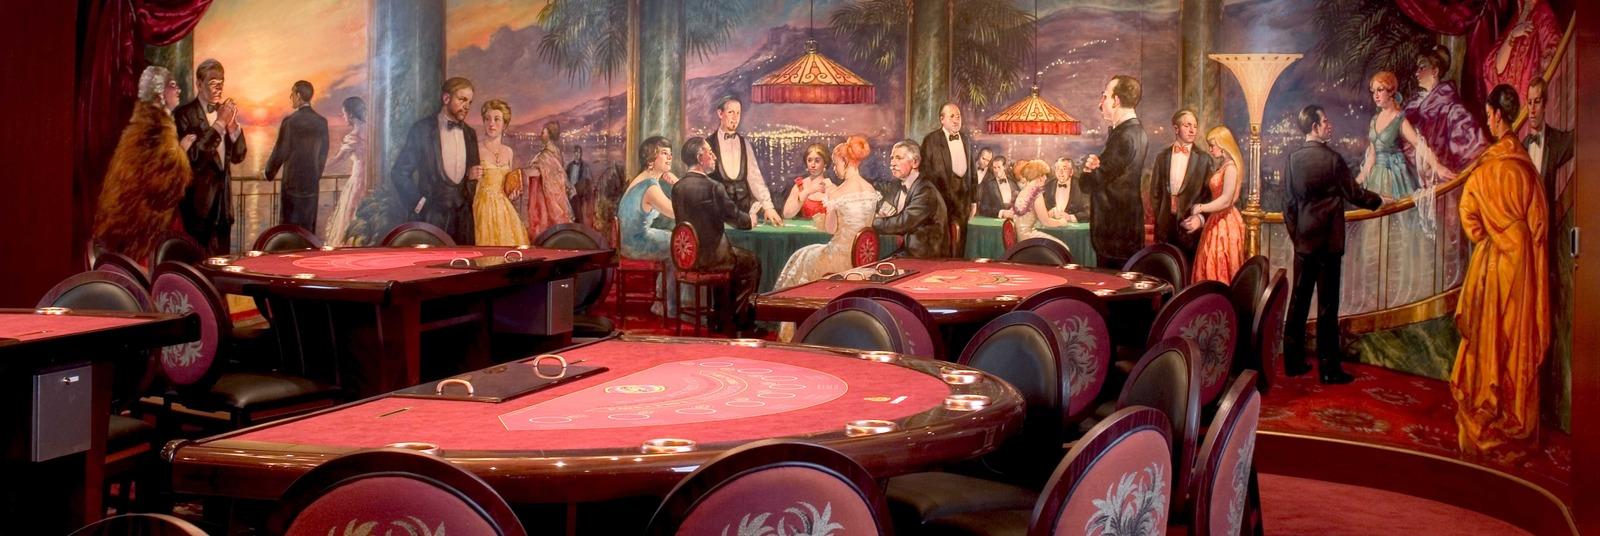 Homepage_large_qm2_empire_casino